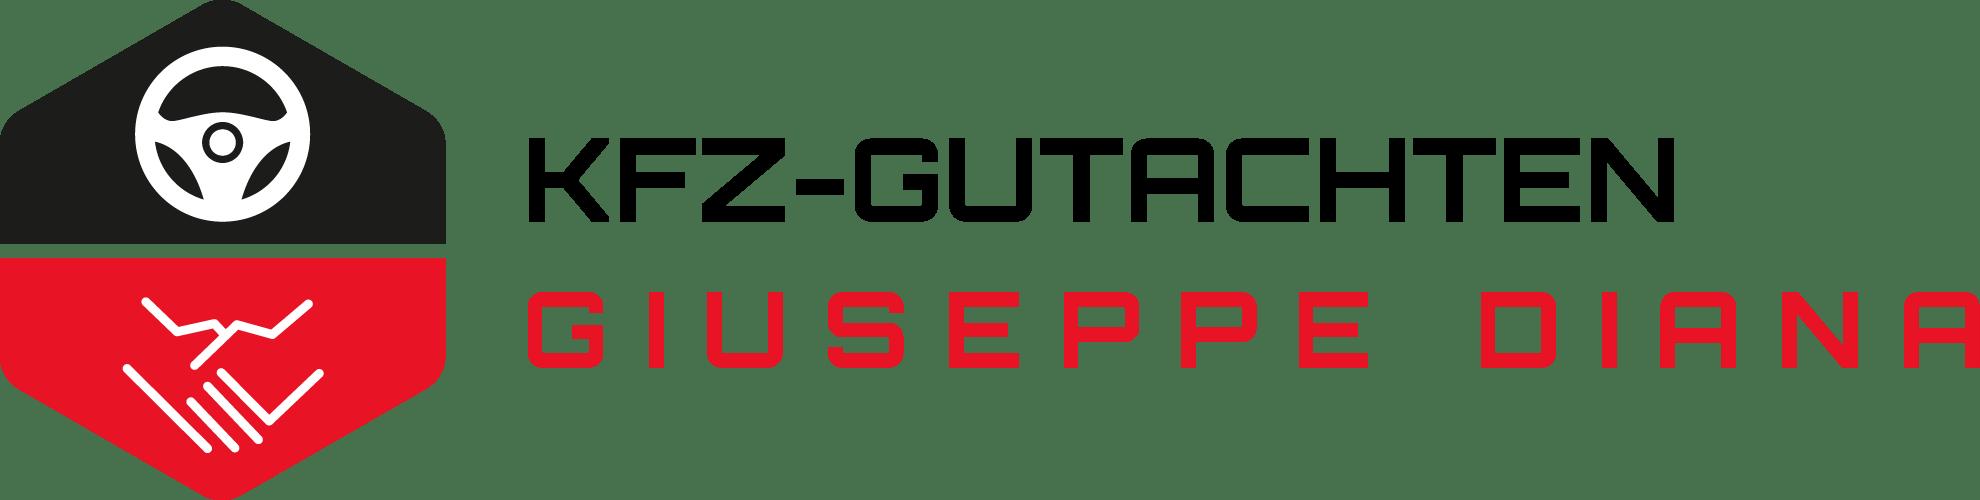 KFZ Gutachter Karlsruhe